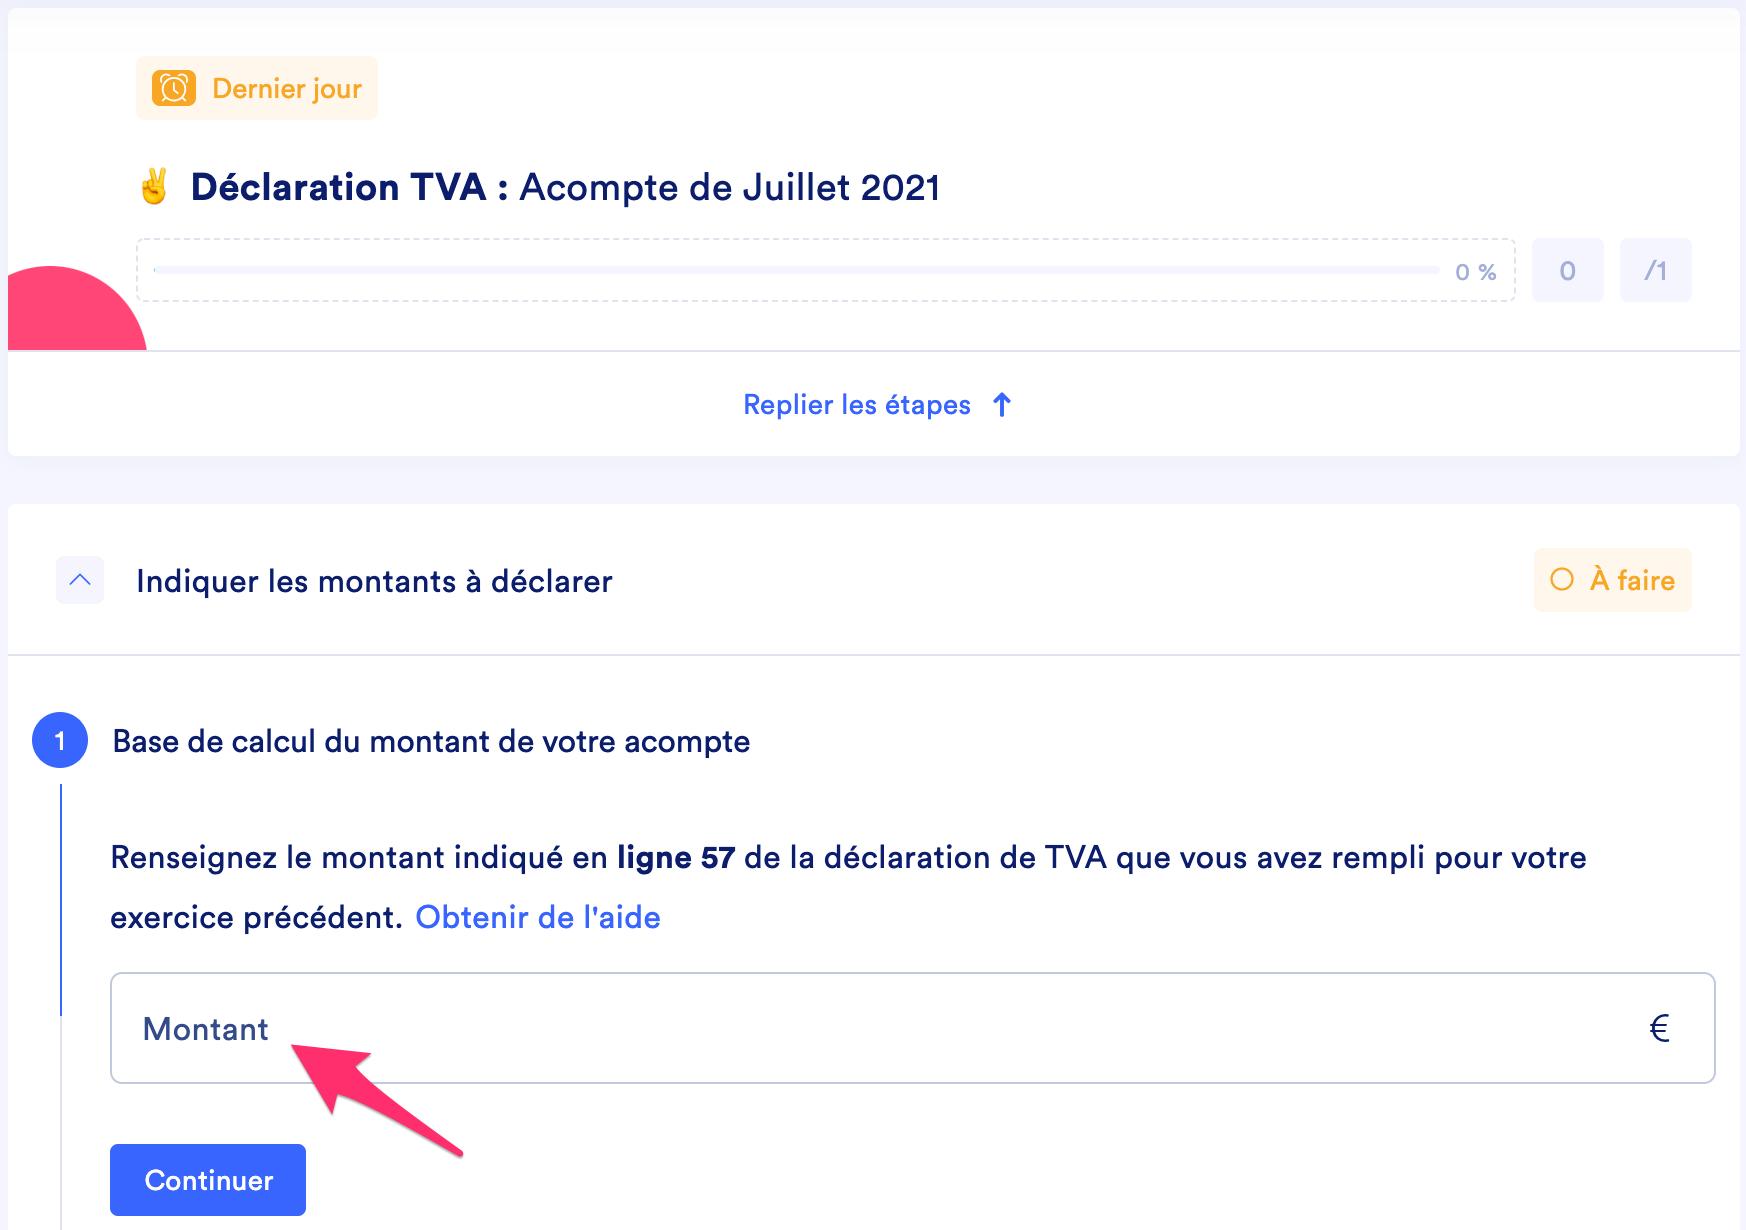 Indy_régime_simplifié_TVA1